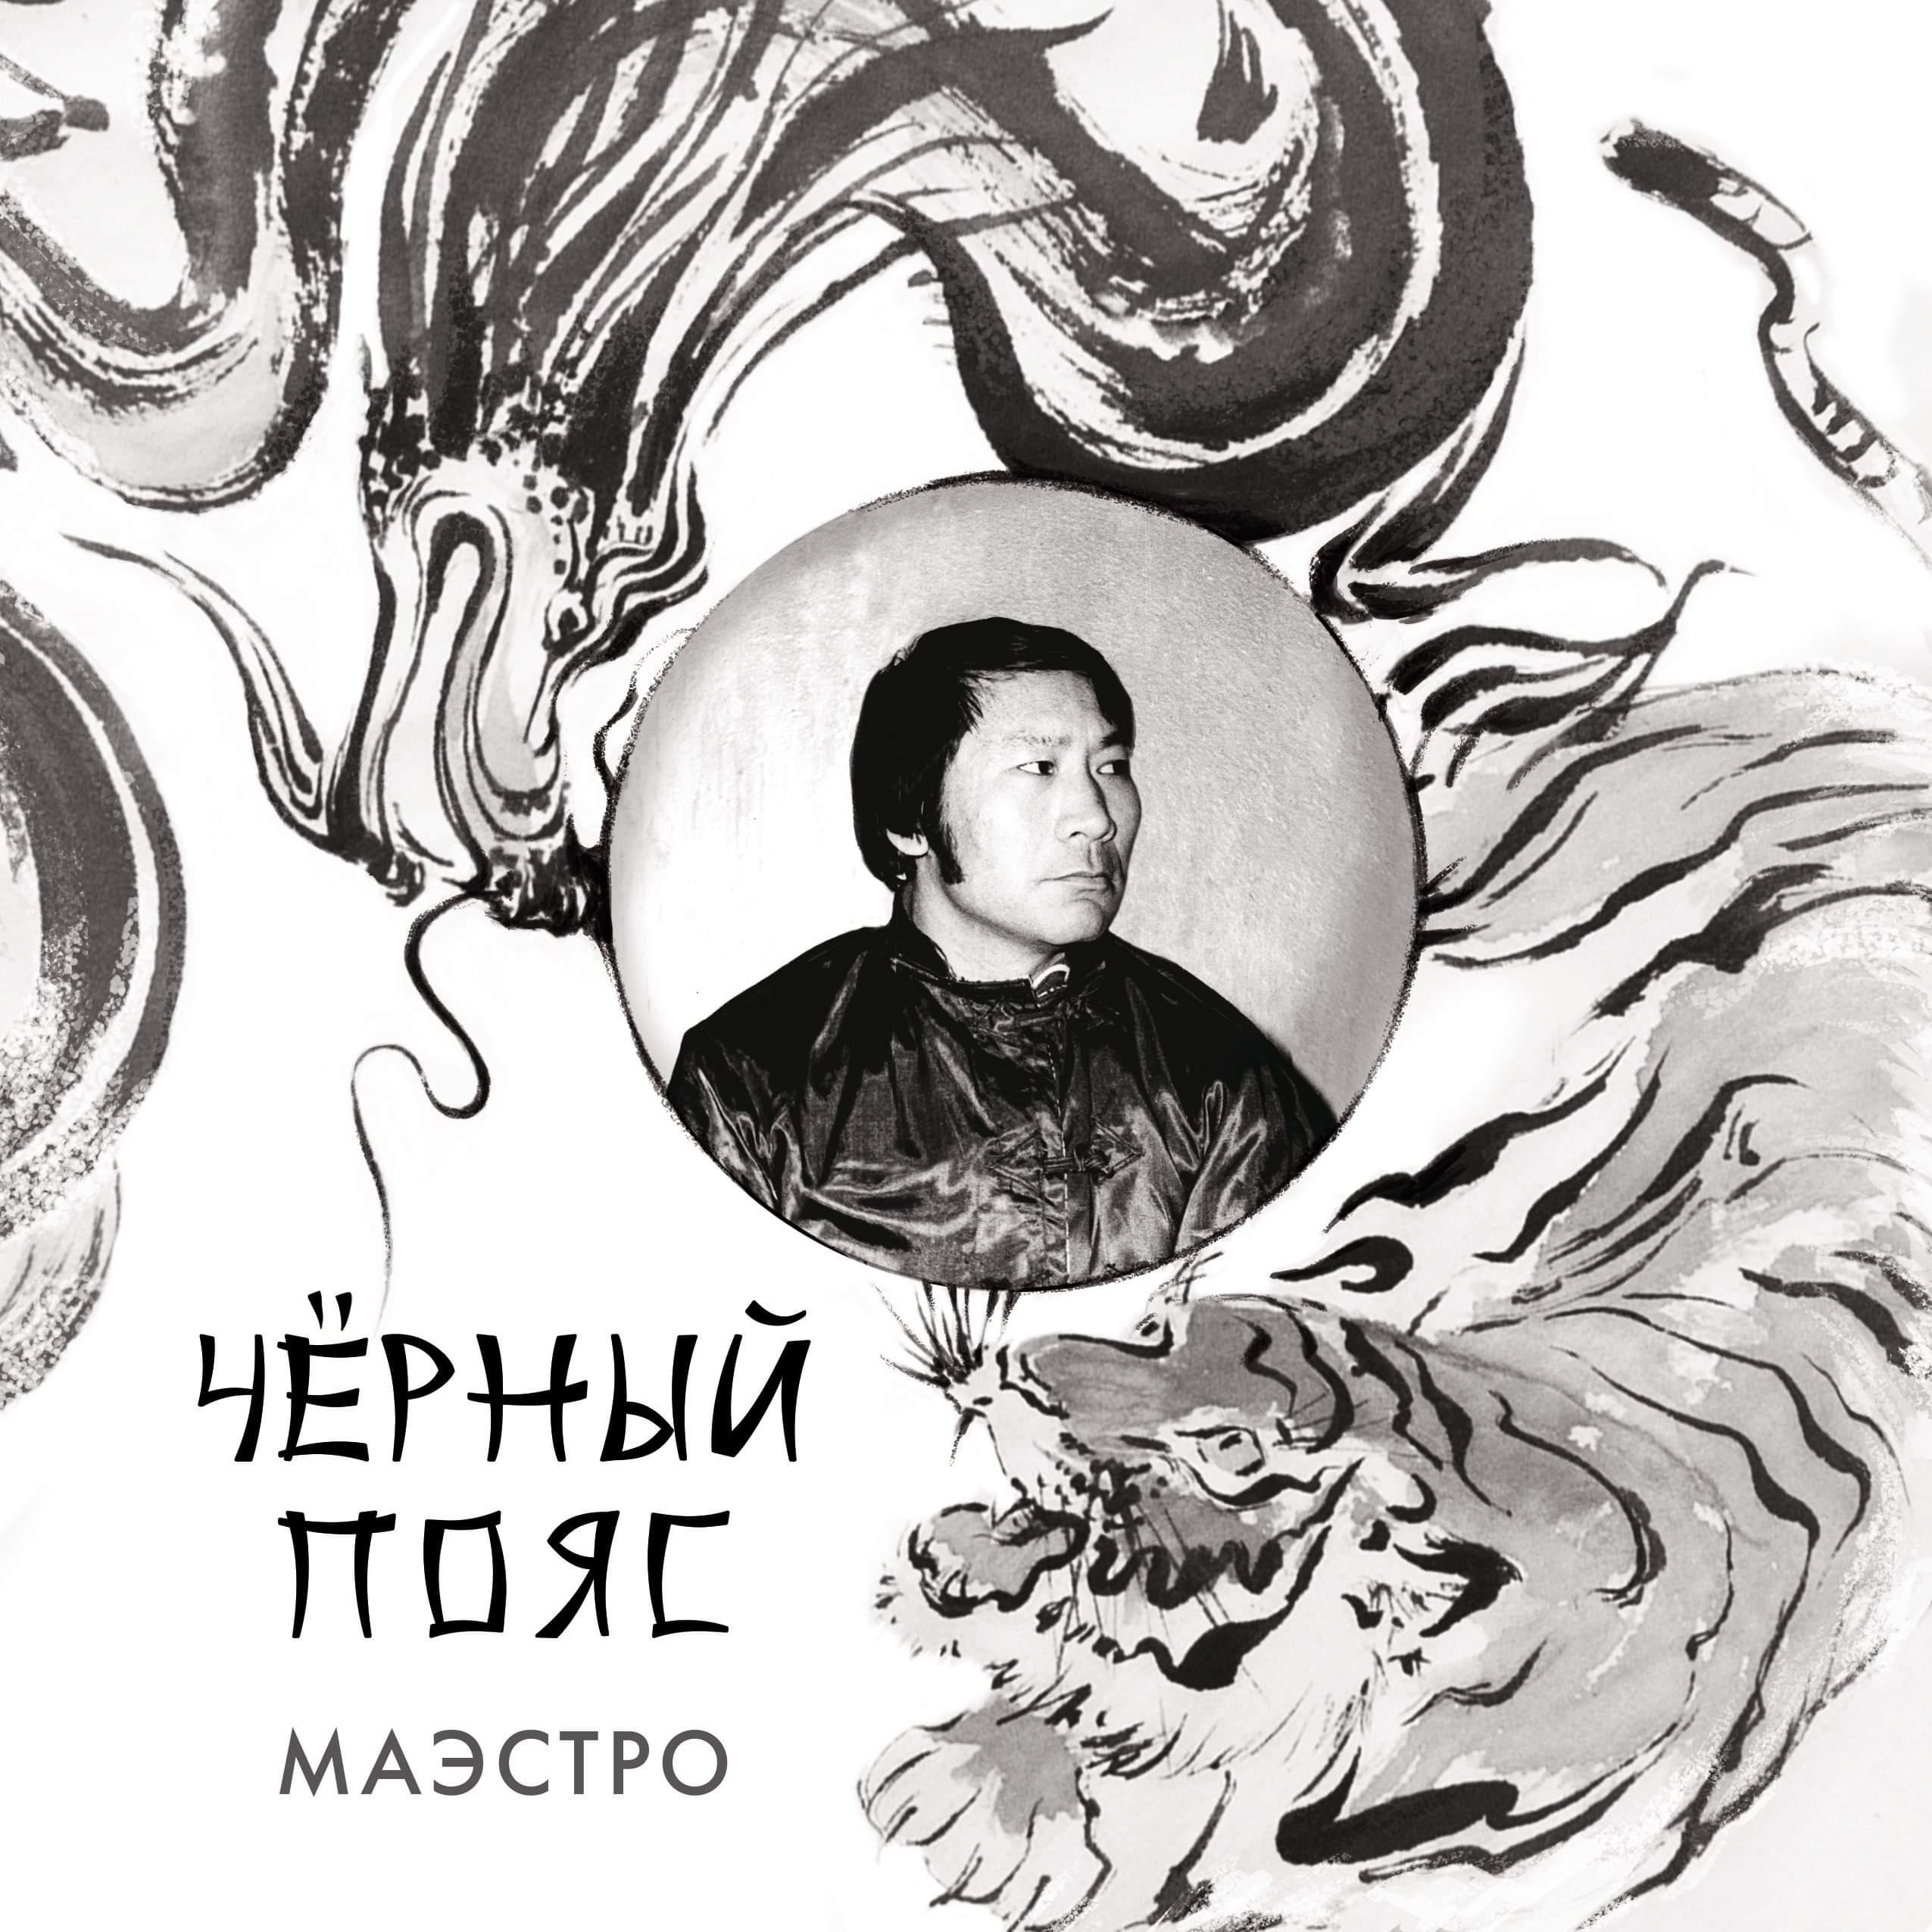 Чёрный пояс Маэстро. Исмаилов Есен Жумазович.